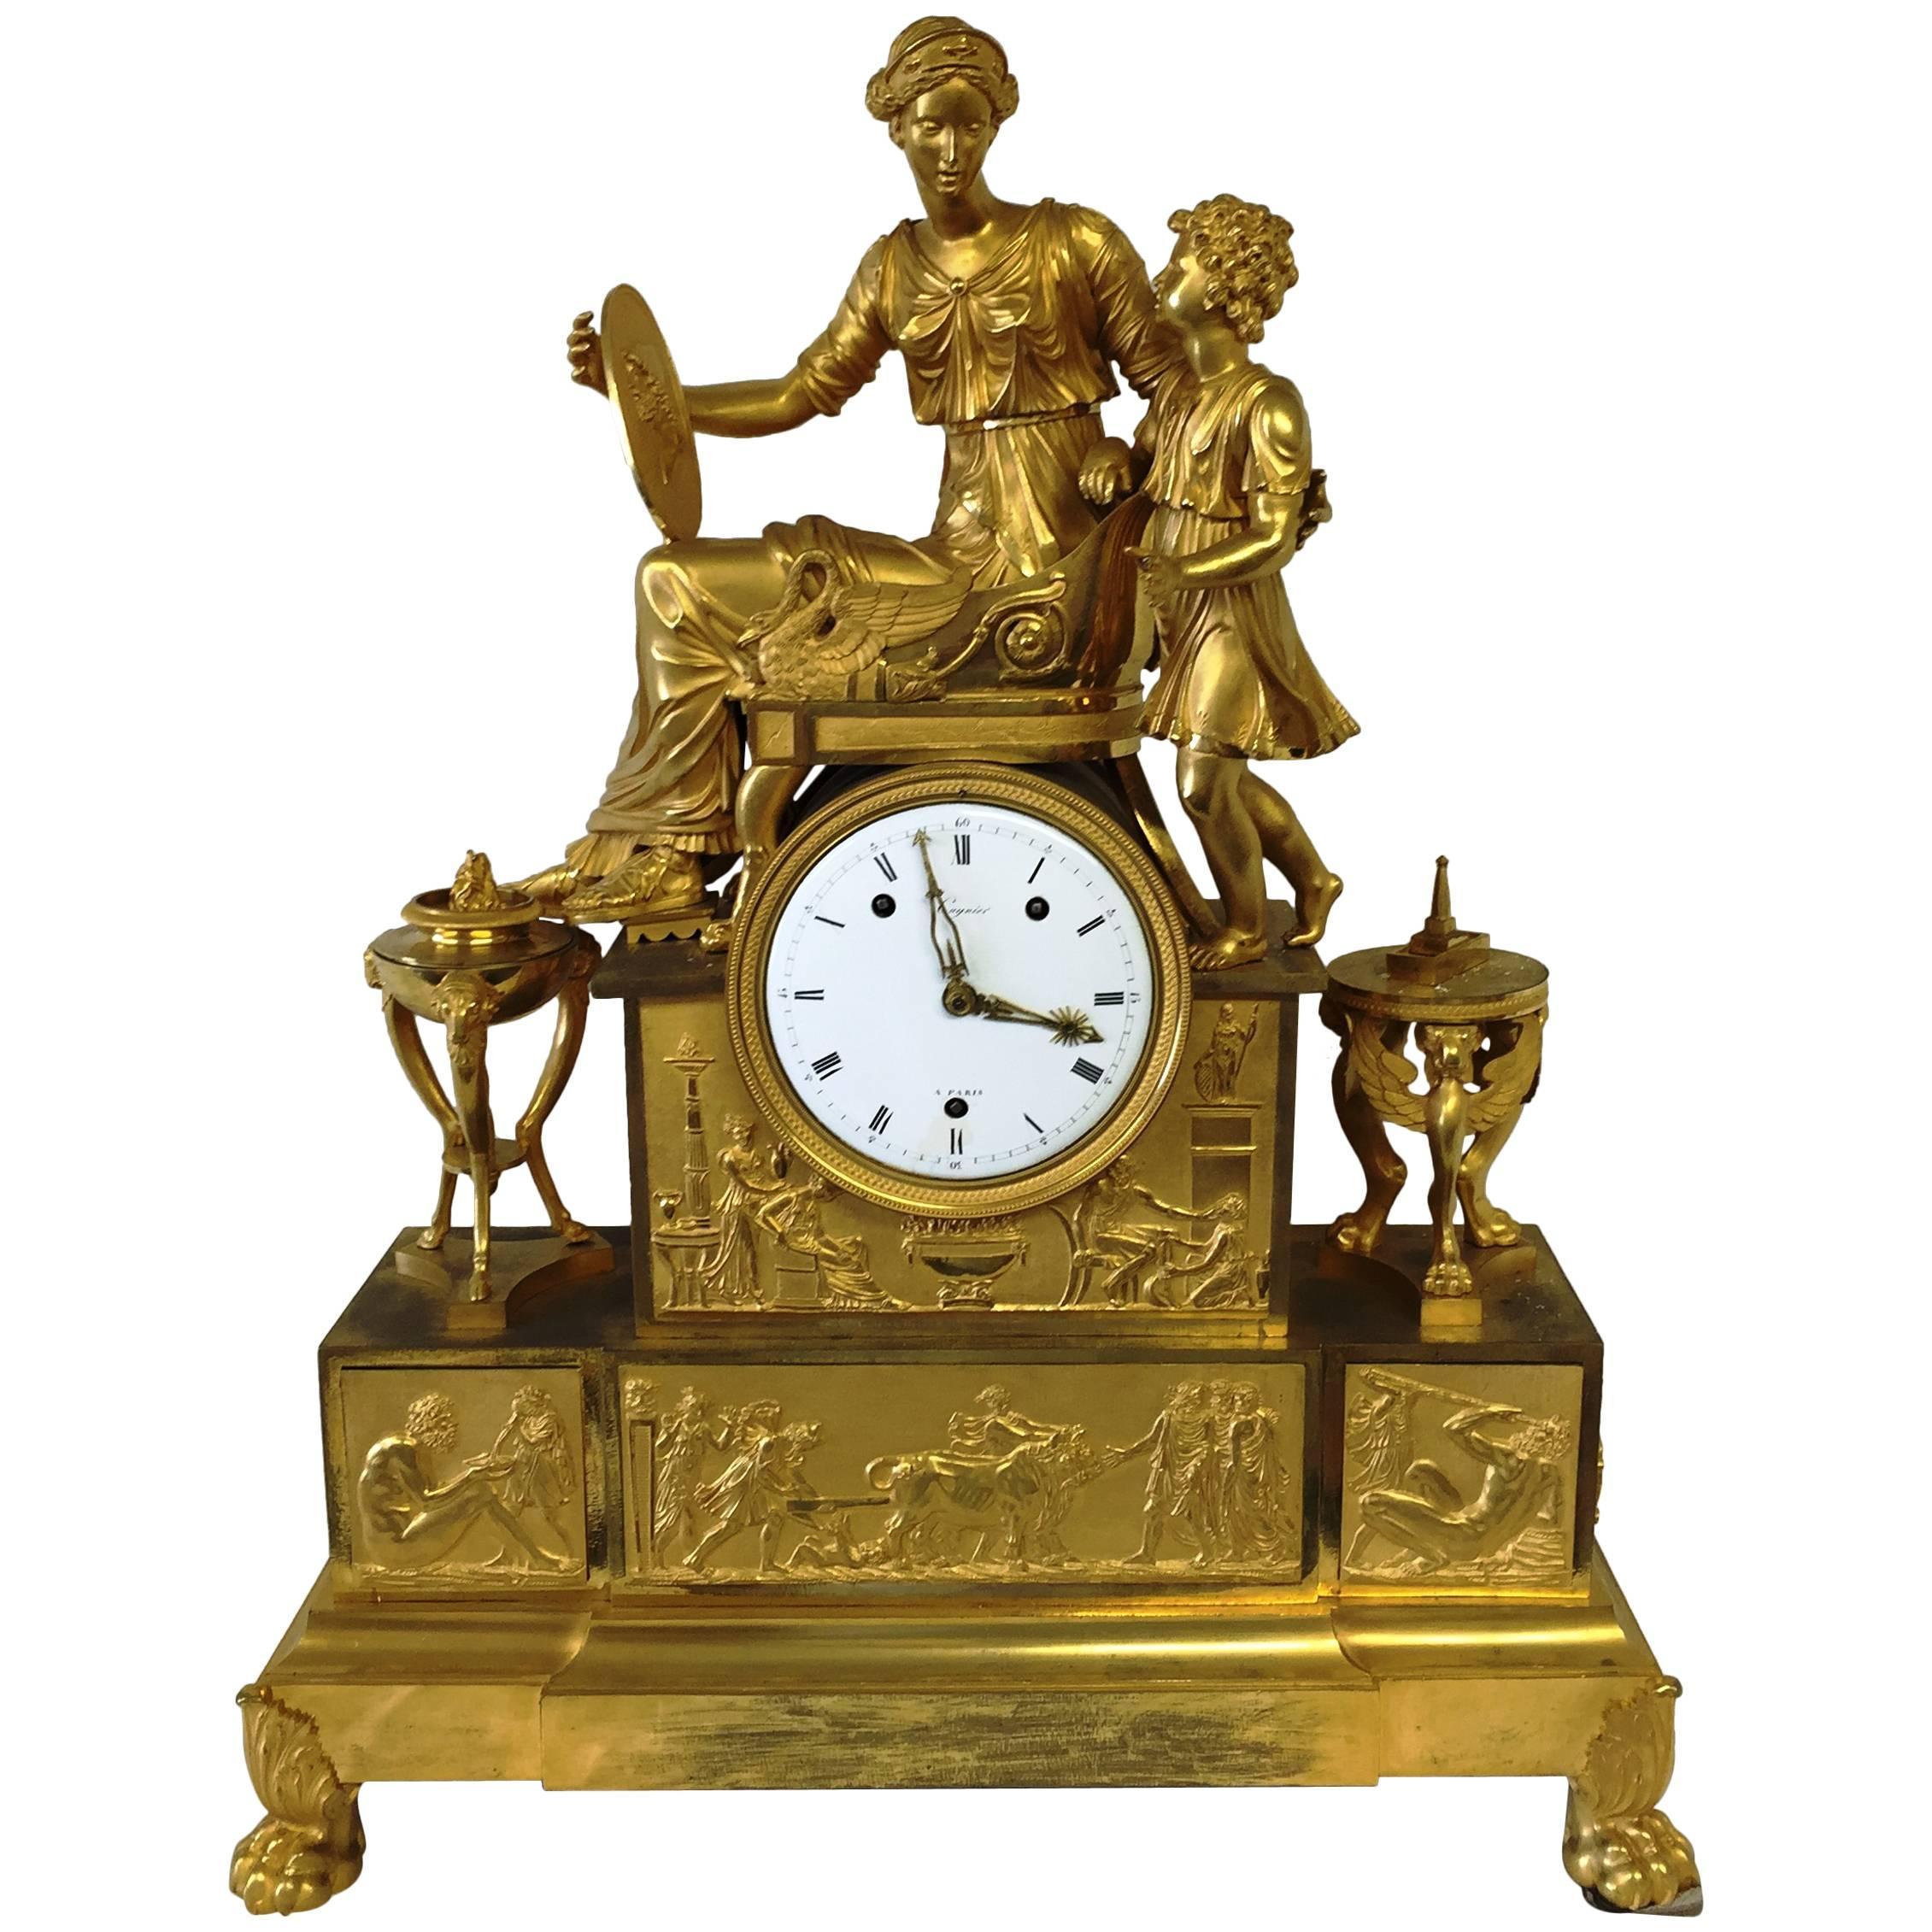 Empire Period Mantel Clock